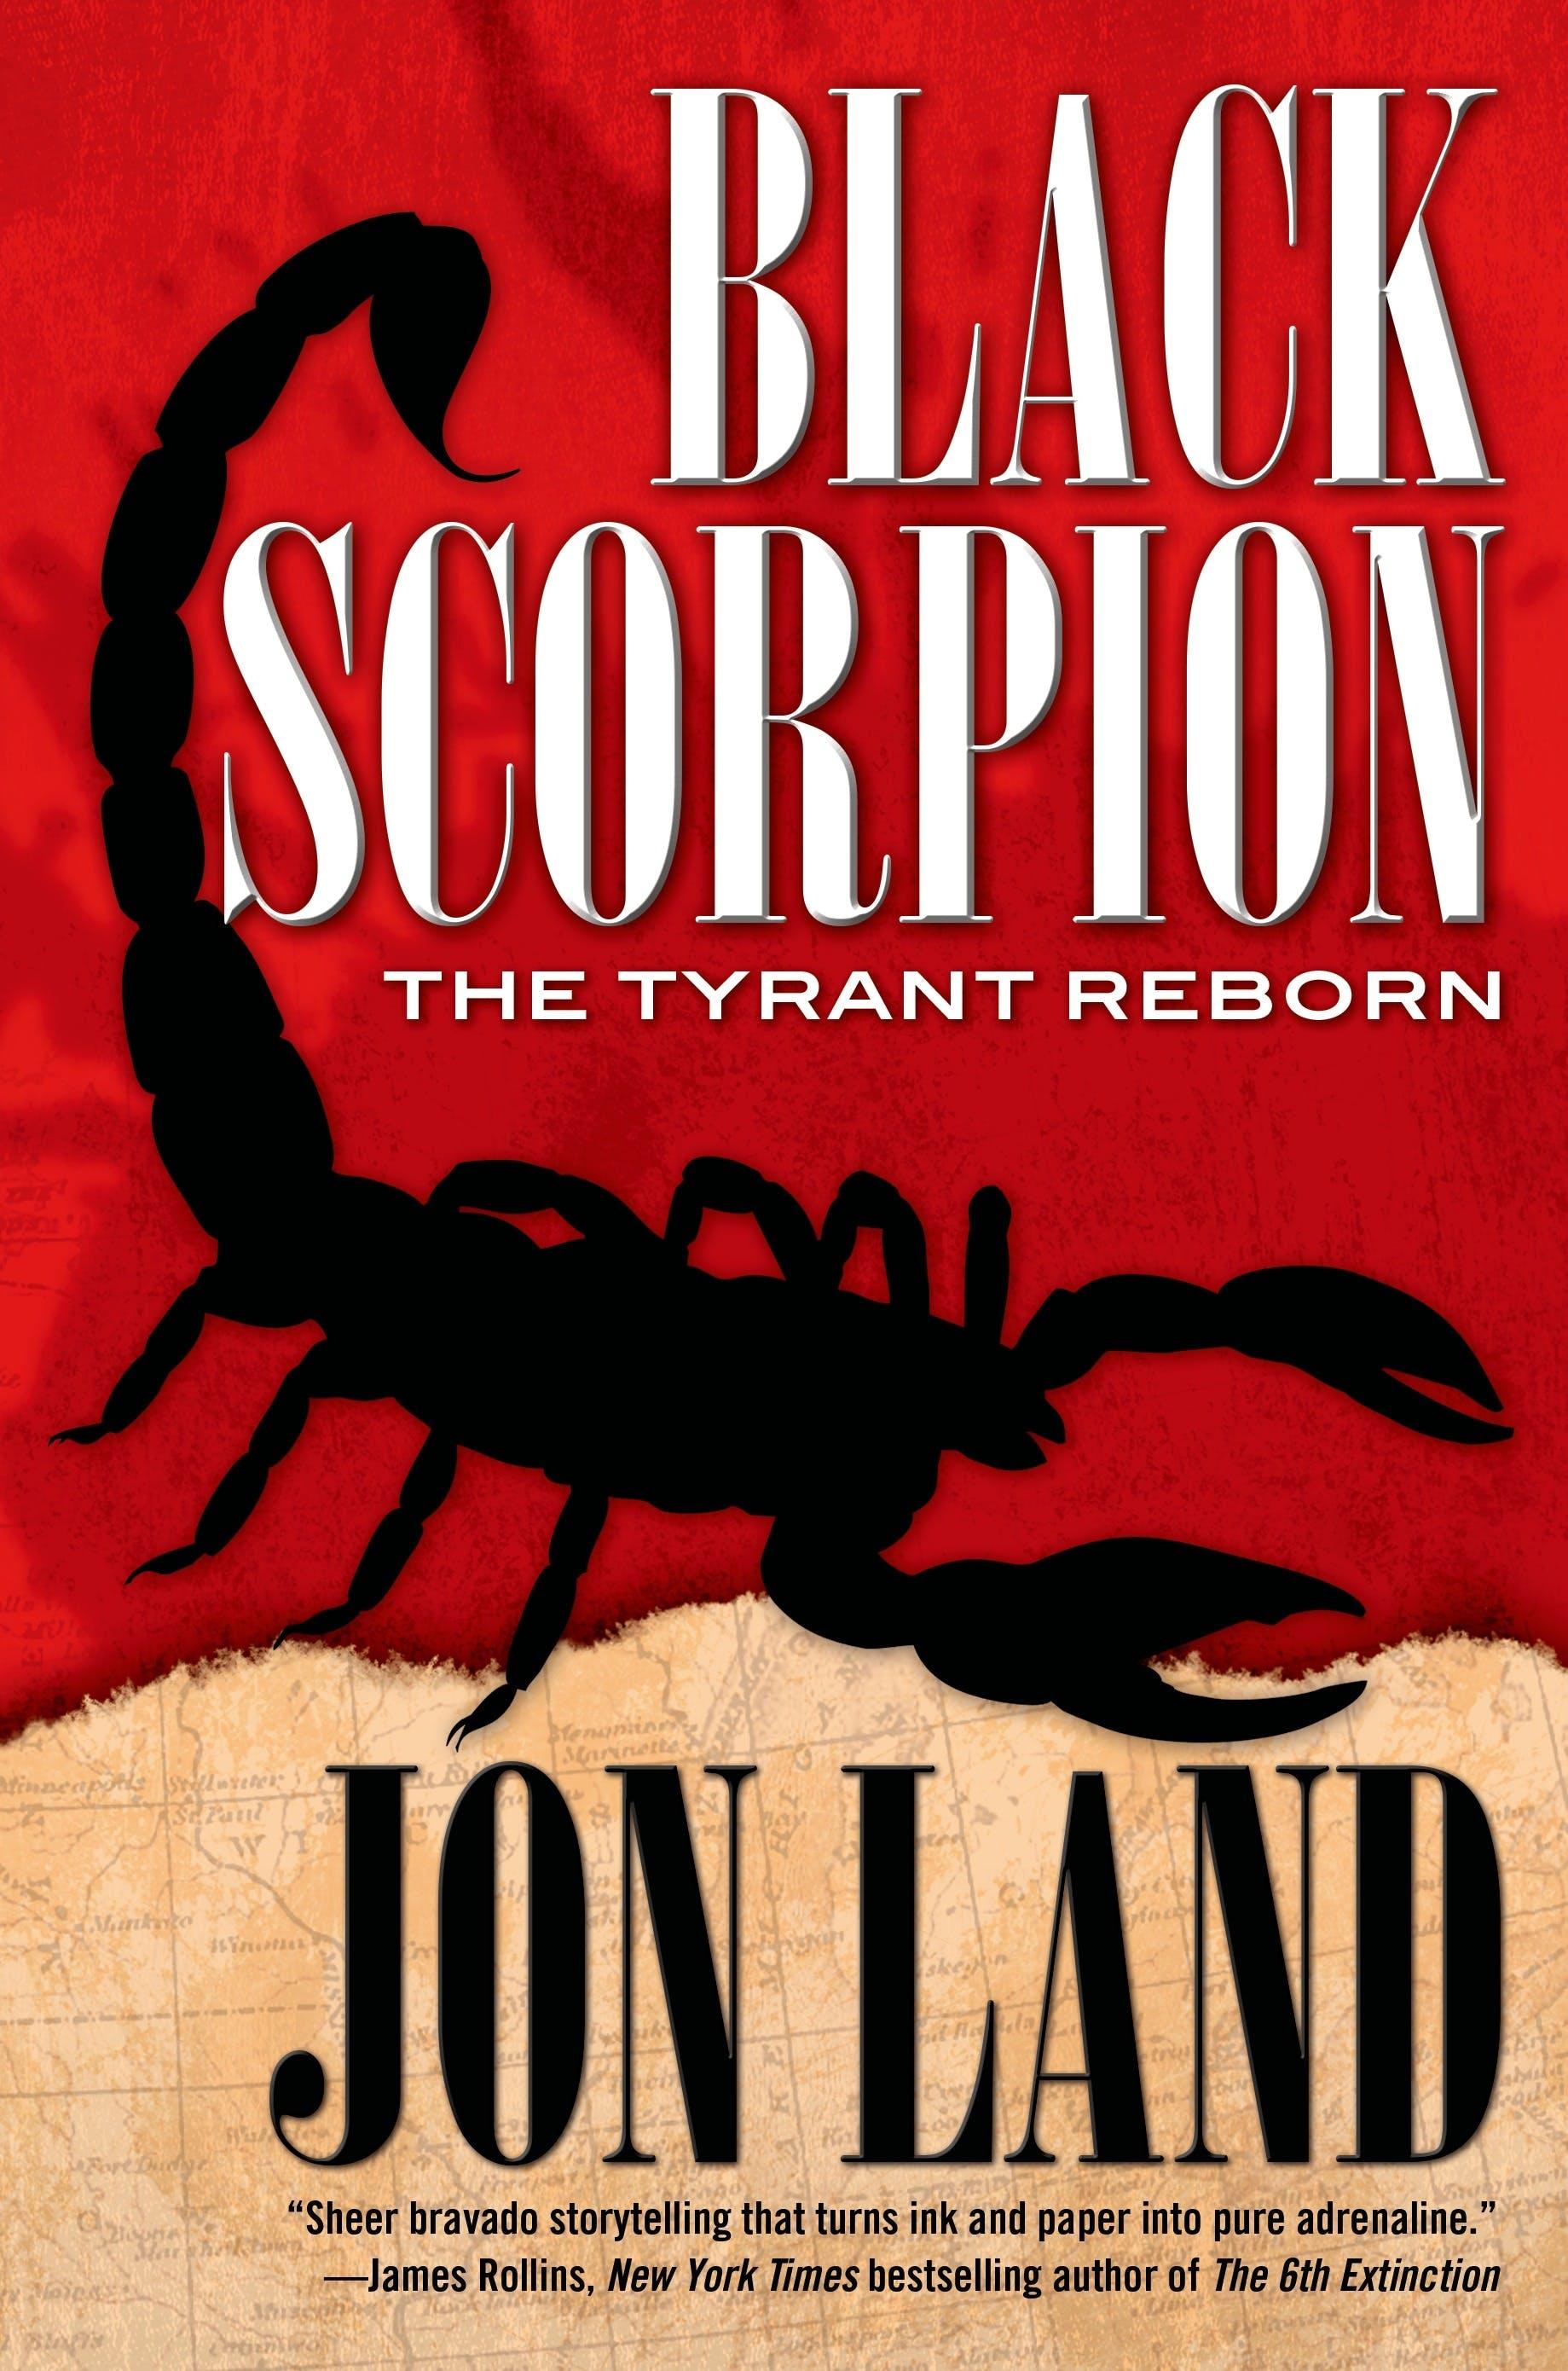 Image of Black Scorpion